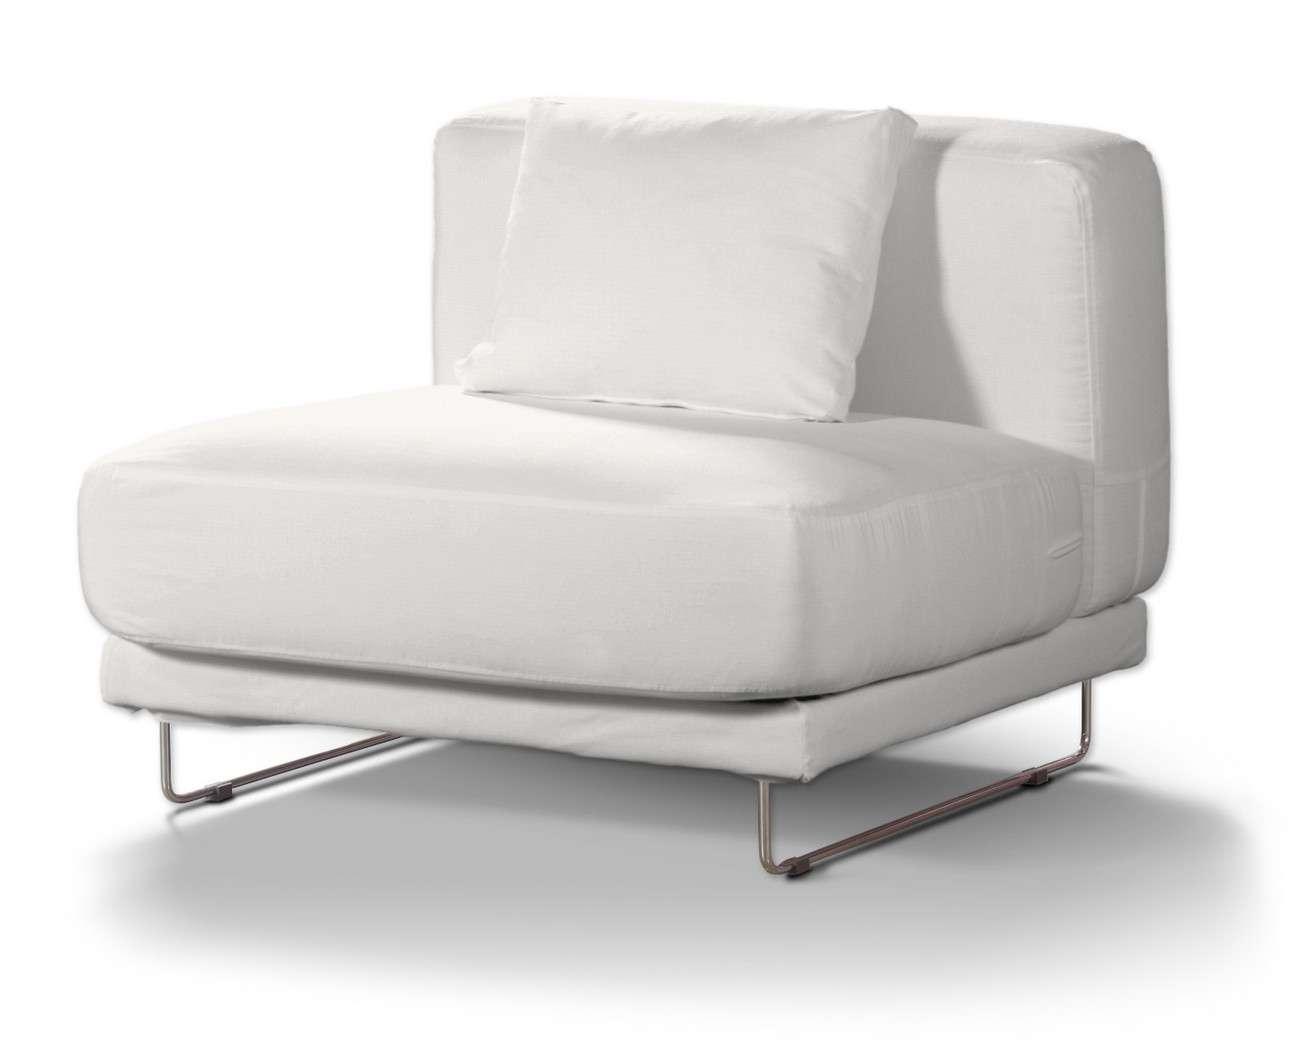 Ikea Stoel Wit : Ikea hoes tylösand stoel wit dekoria